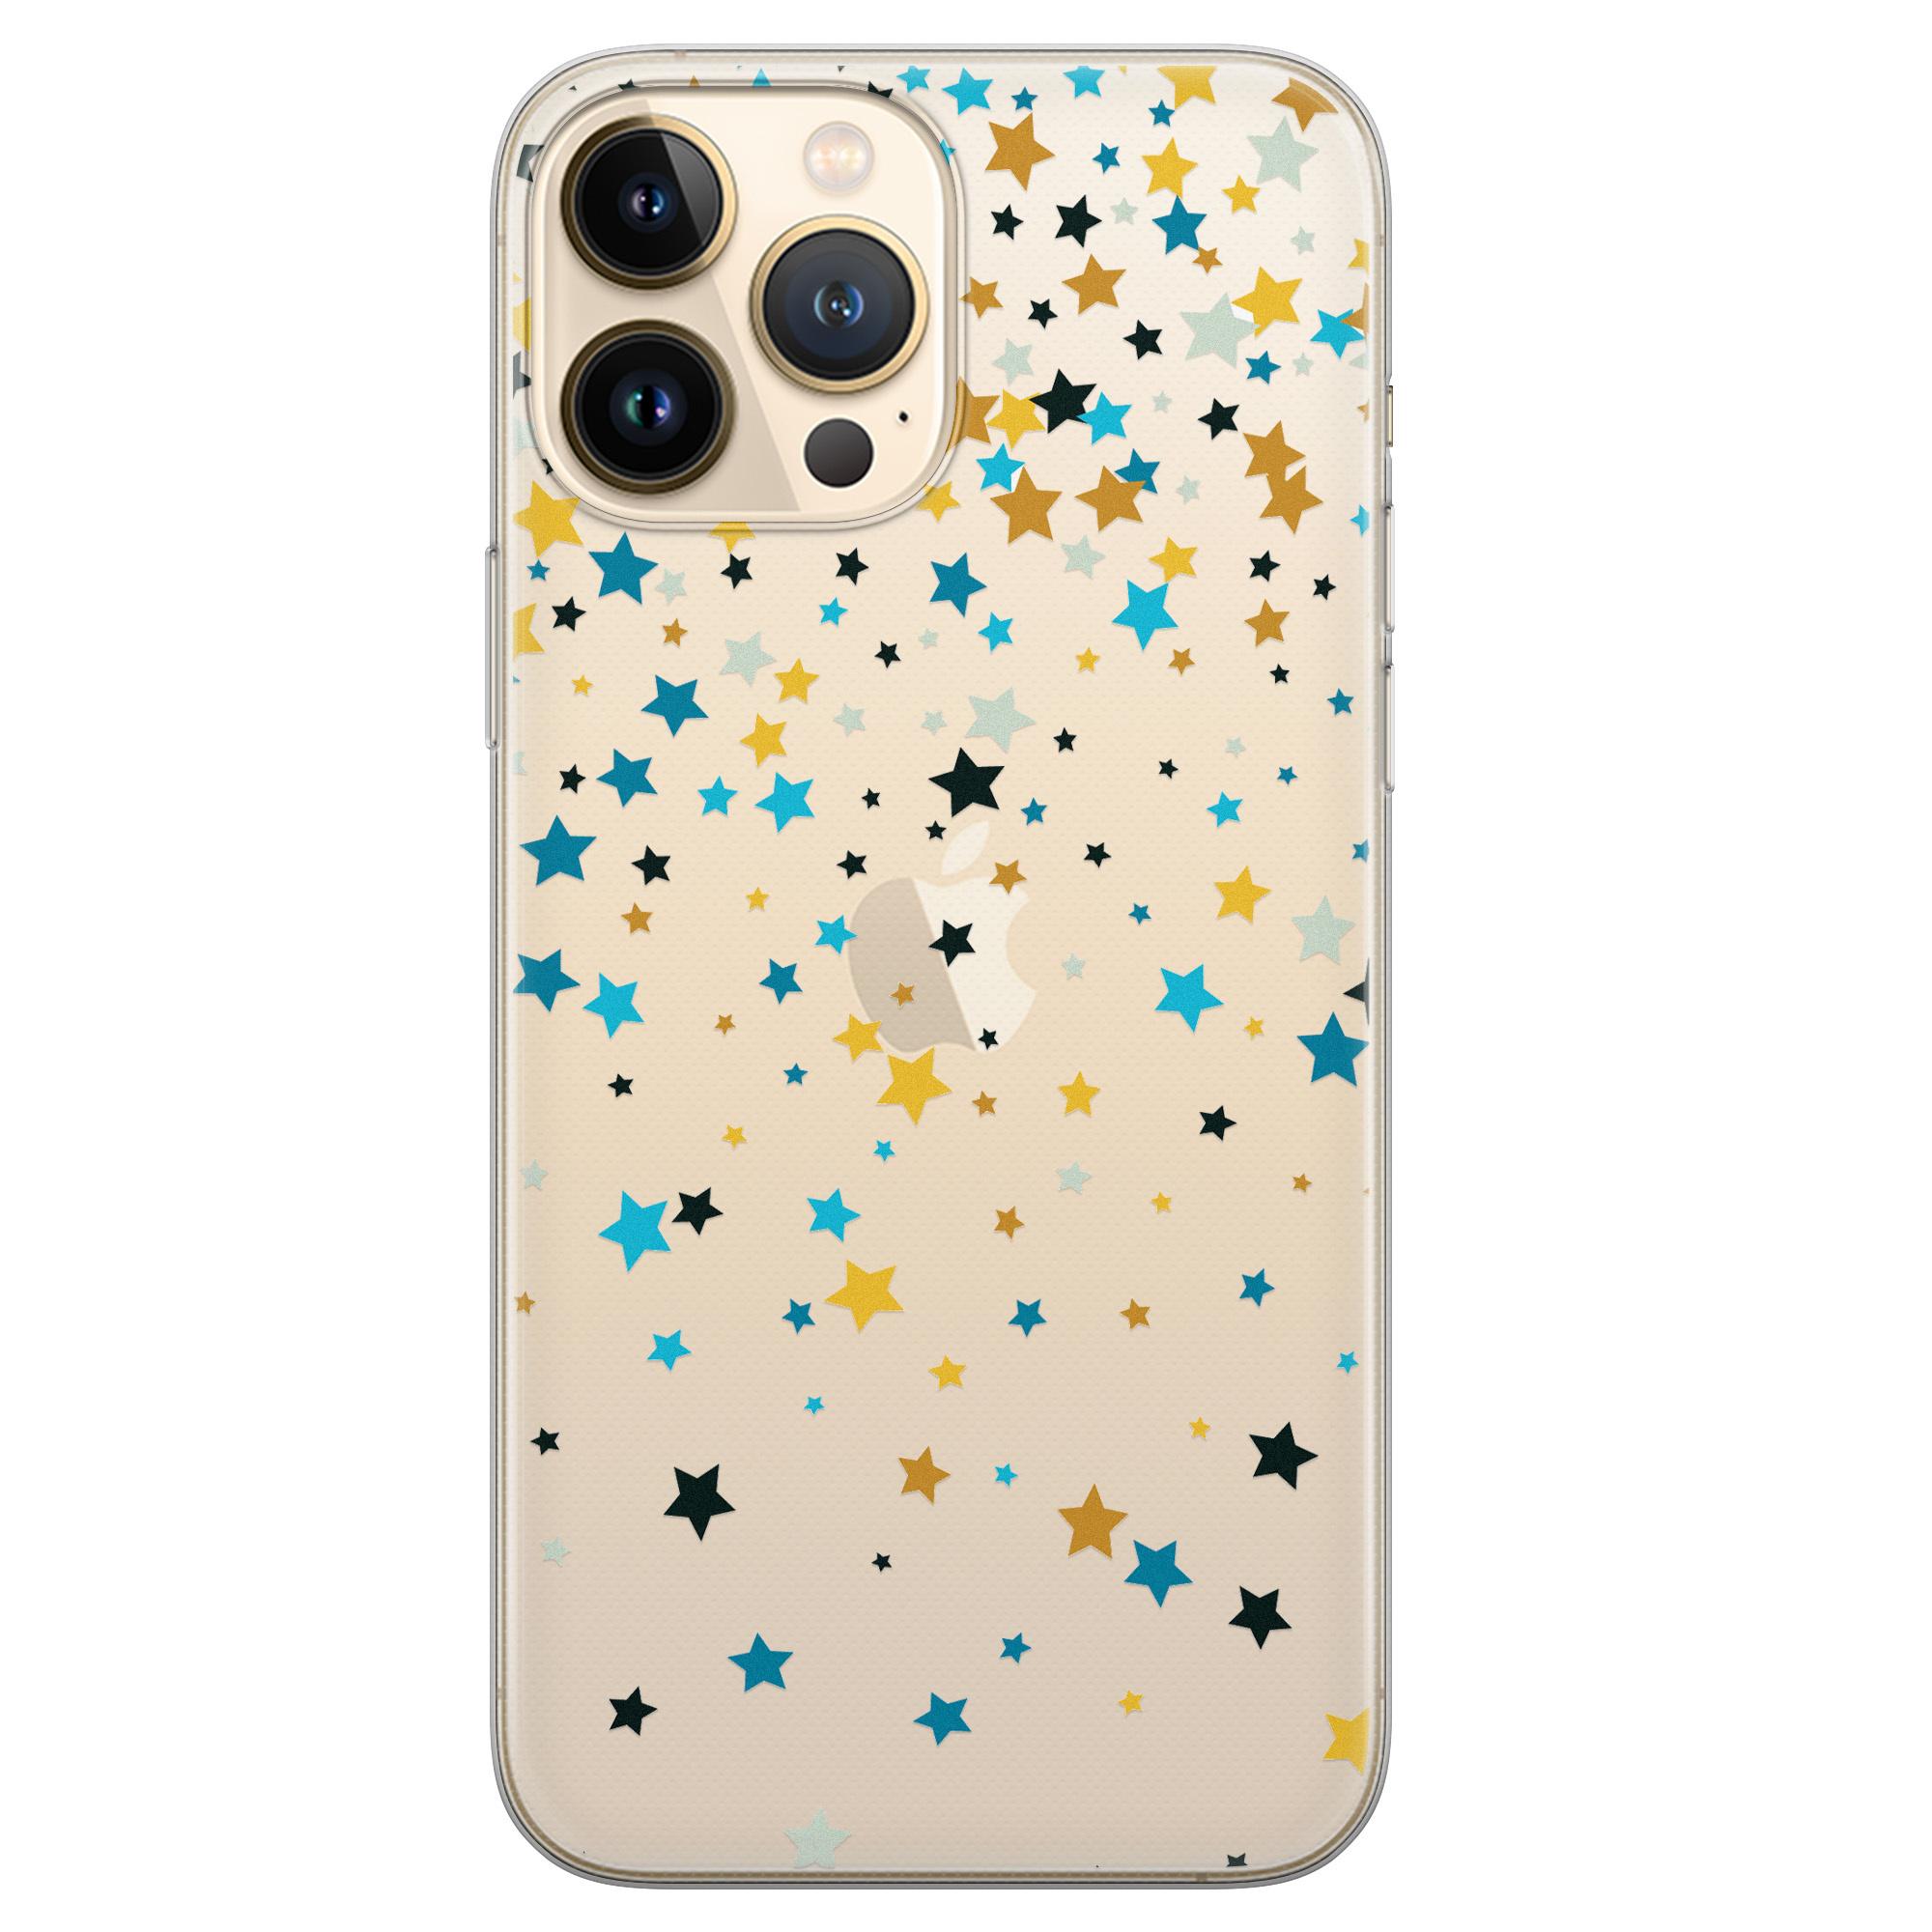 Leuke Telefoonhoesjes iPhone 13 Pro Max siliconen hoesje - Sterretjes